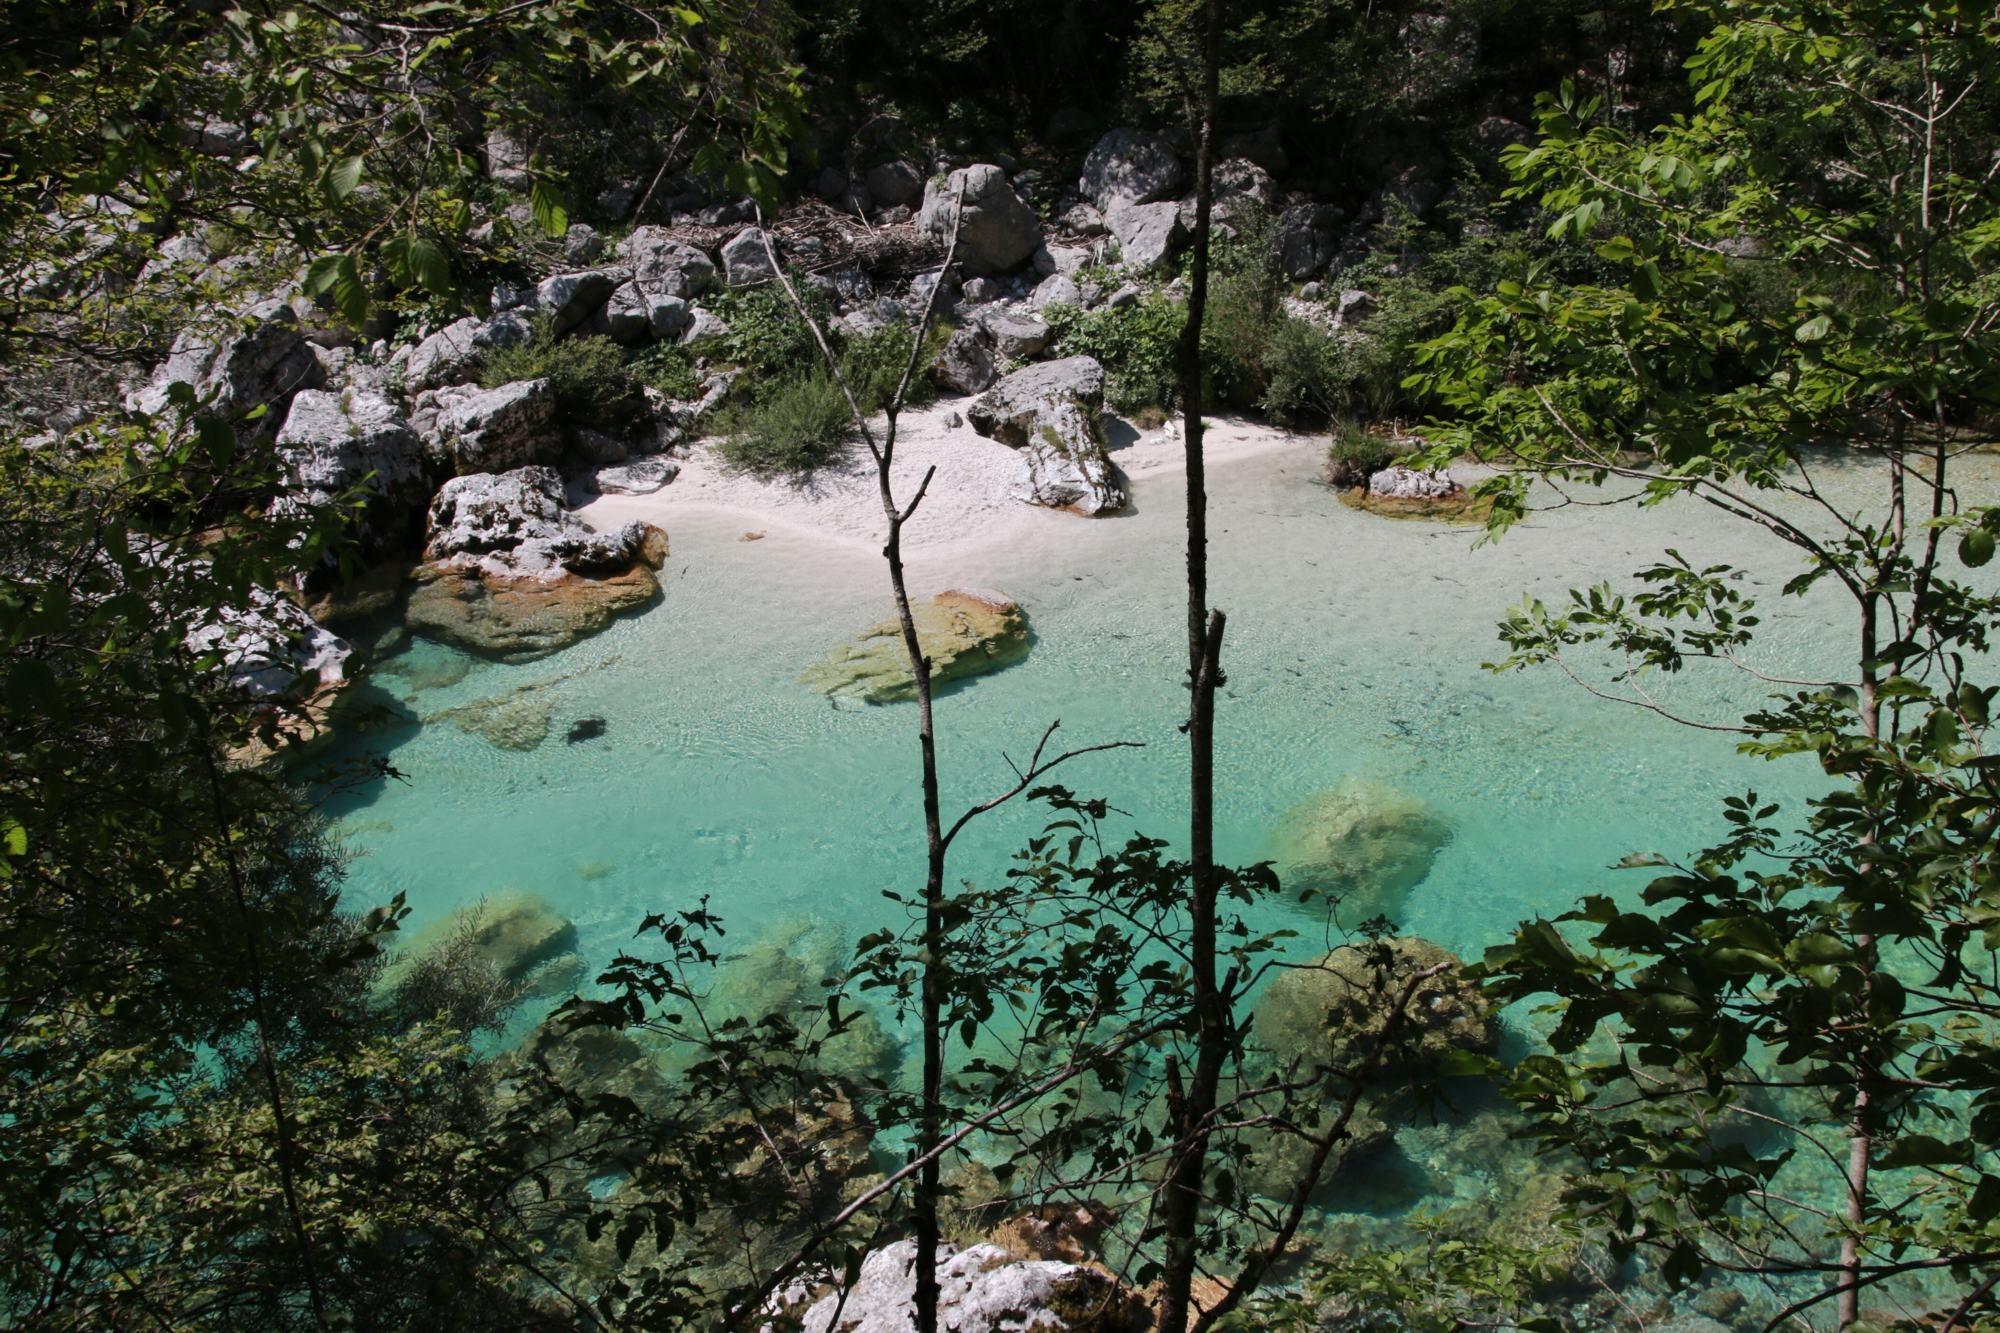 Alpe Adria Trail Wandern